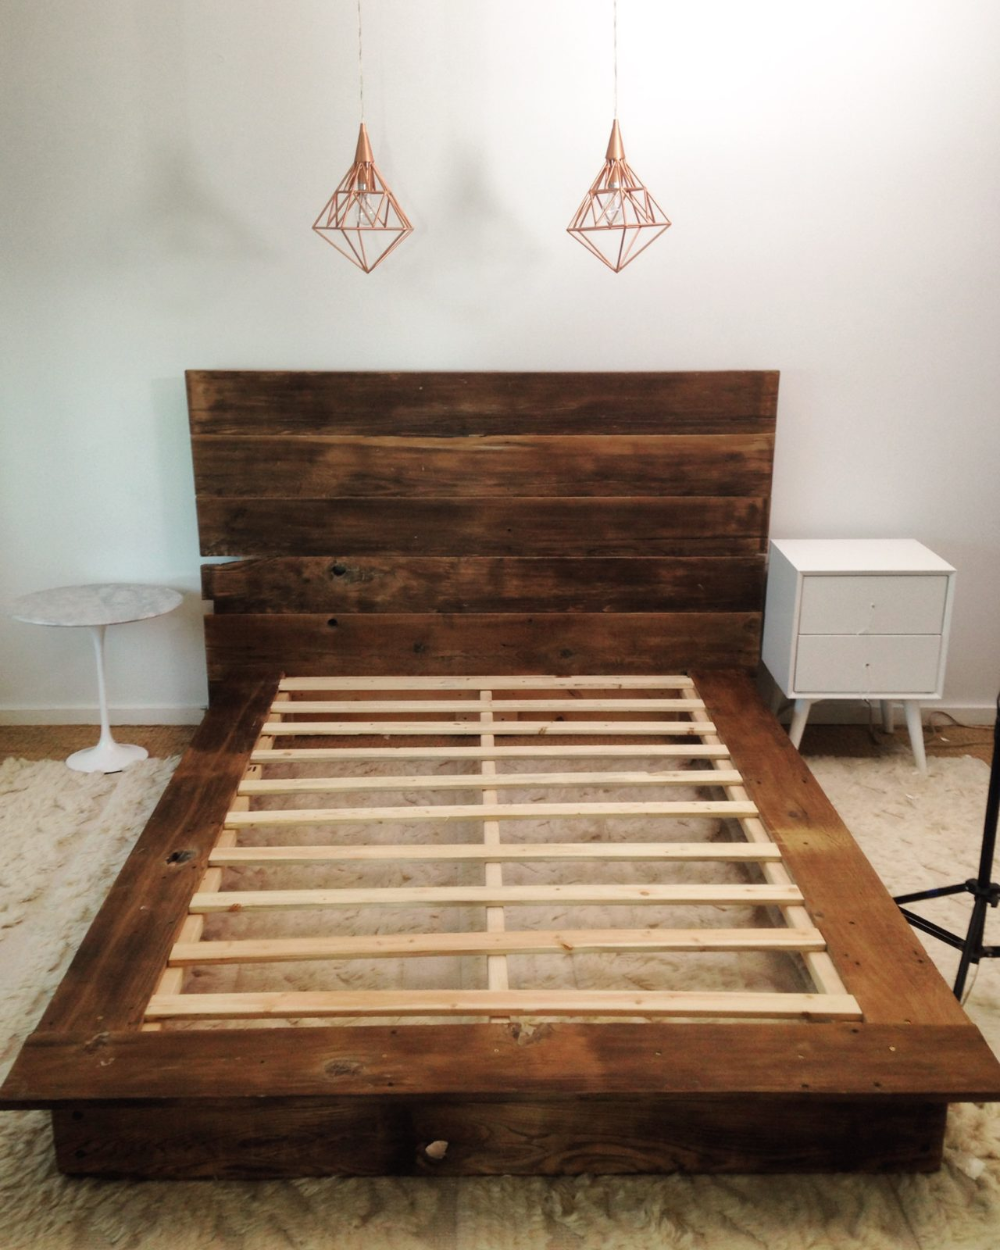 Wood Bed Platforms